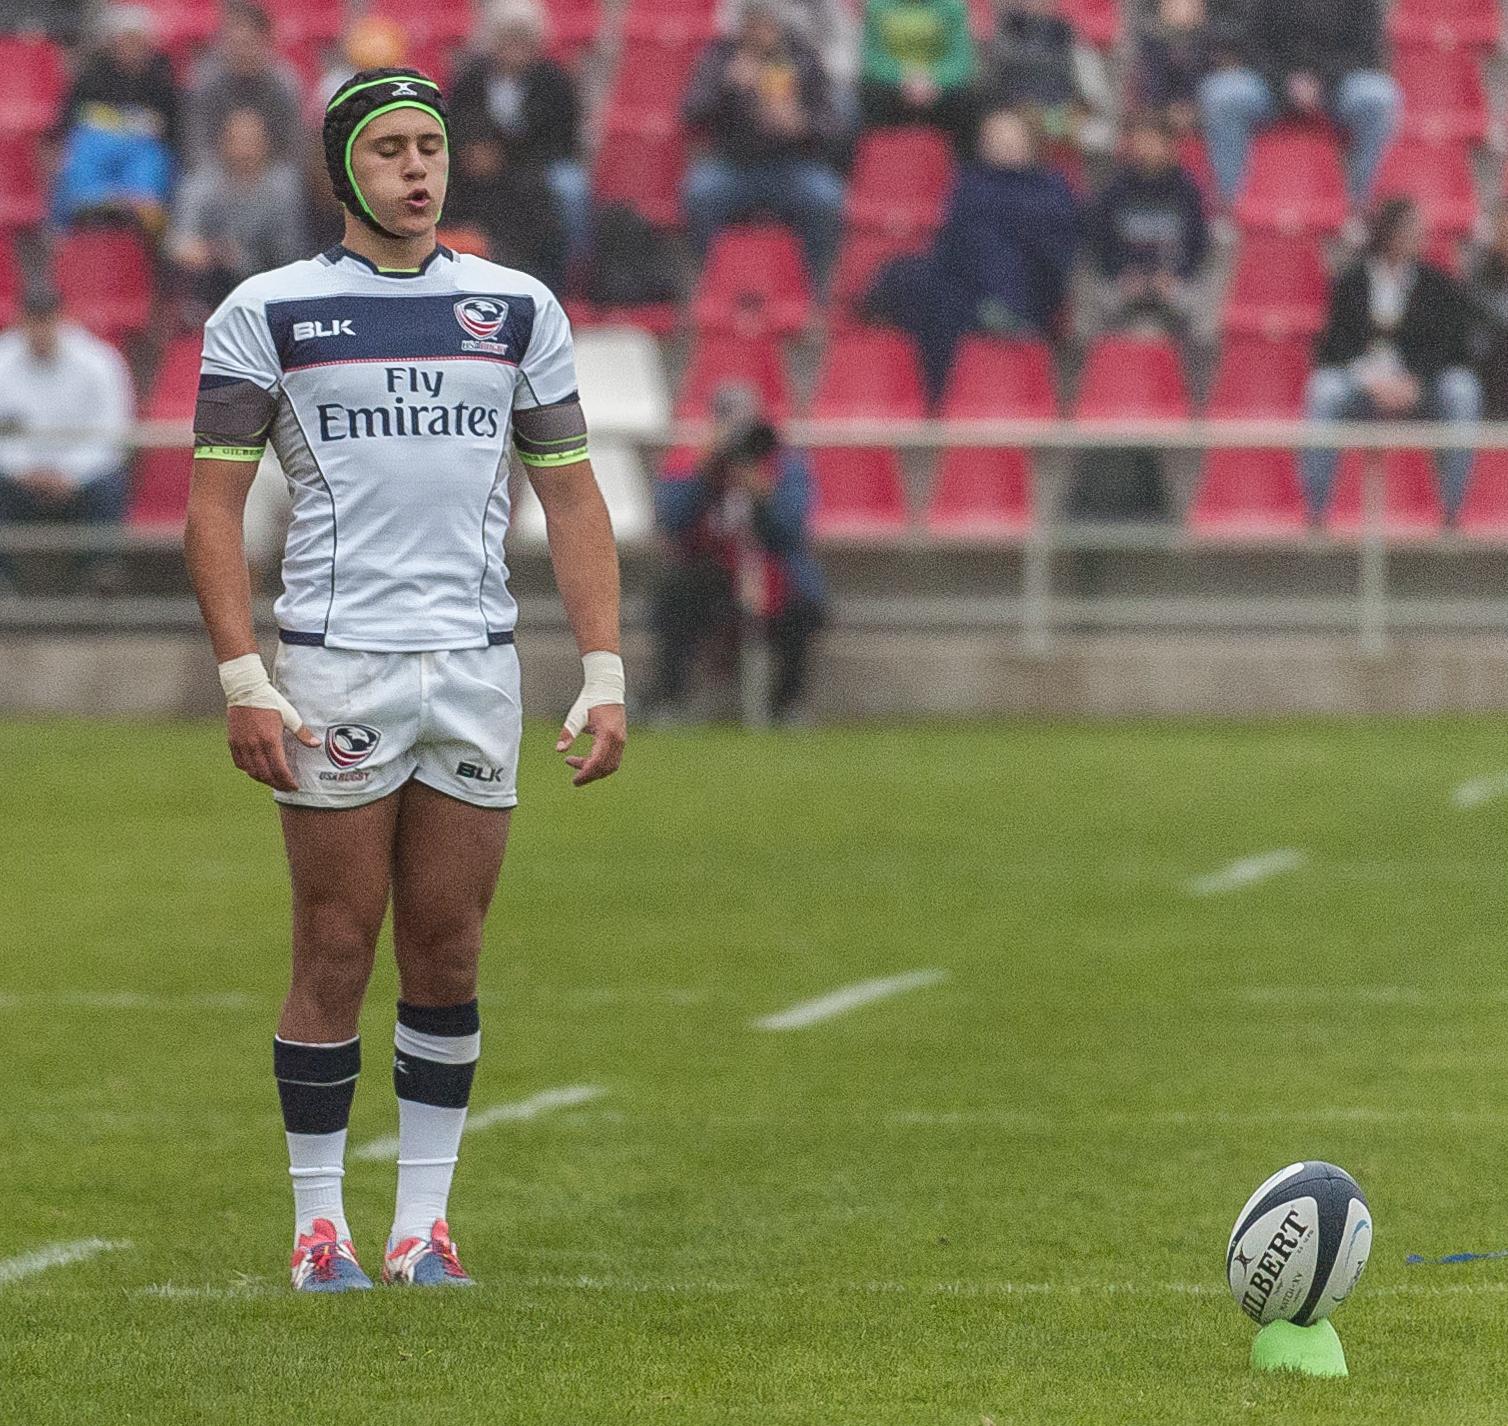 Ben Cima lines up a kick for USA v Uruguay Feb 4. Colleen McCloskey photo